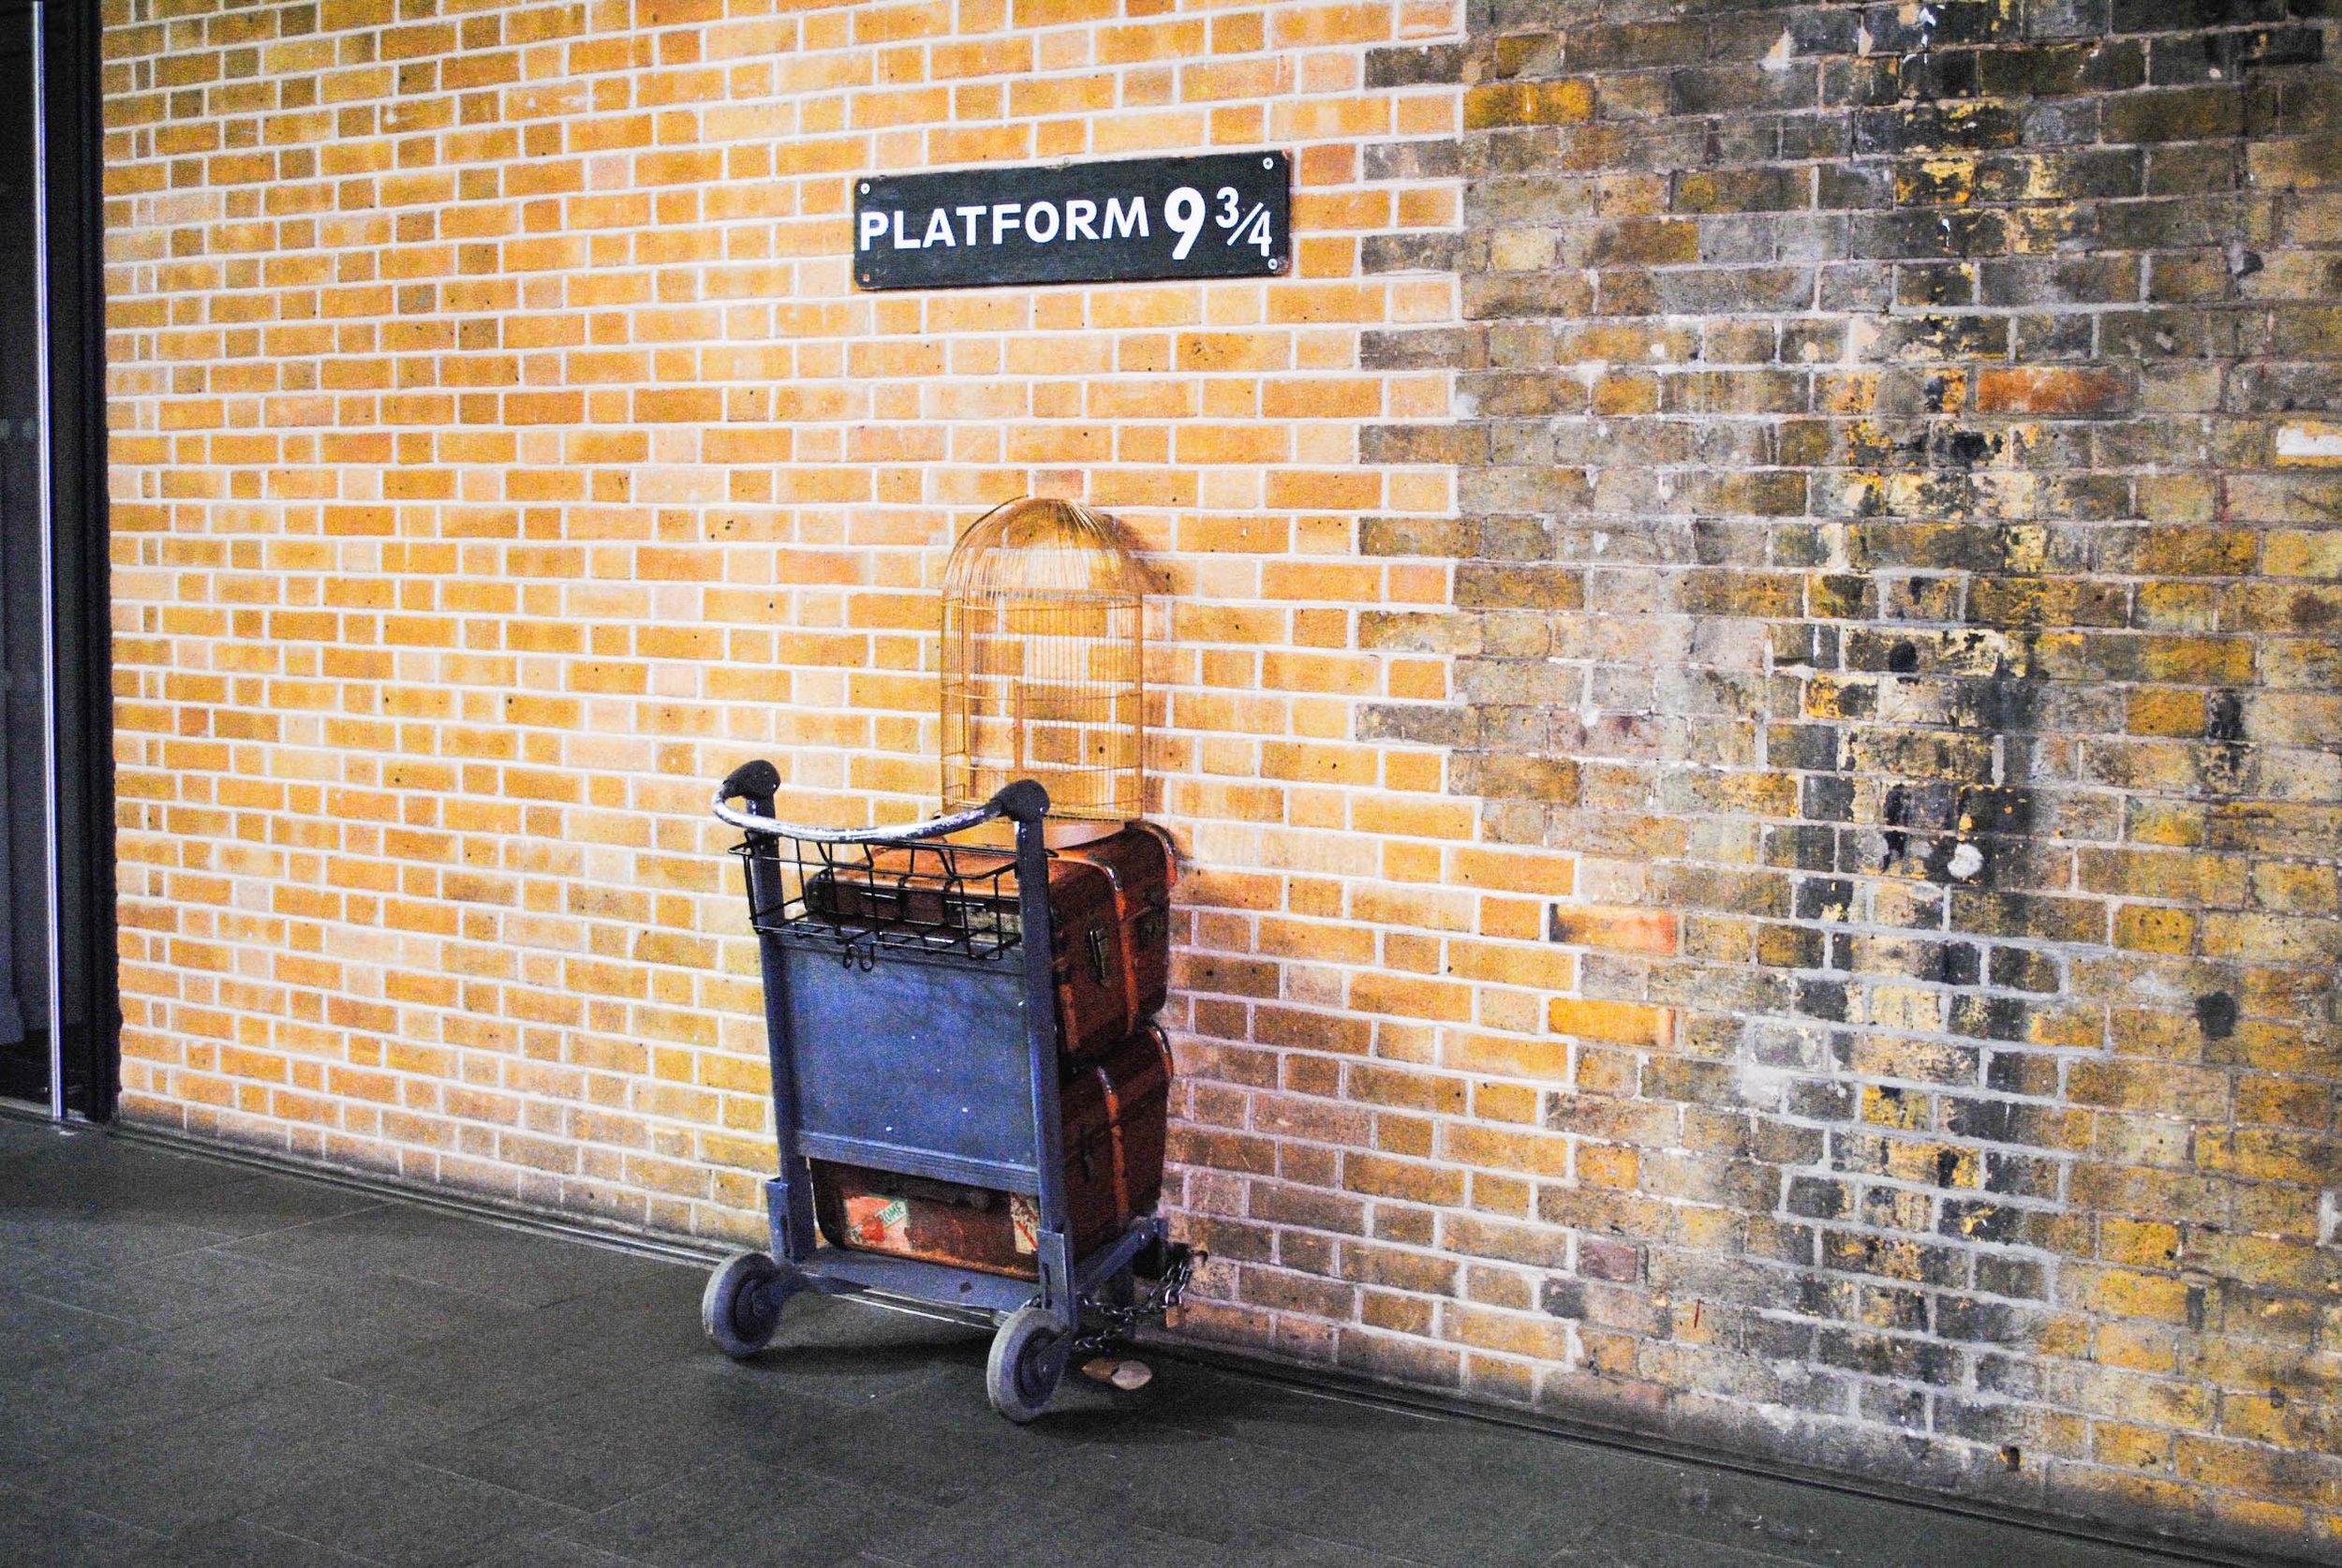 Platform 9 3/4 in London, UK